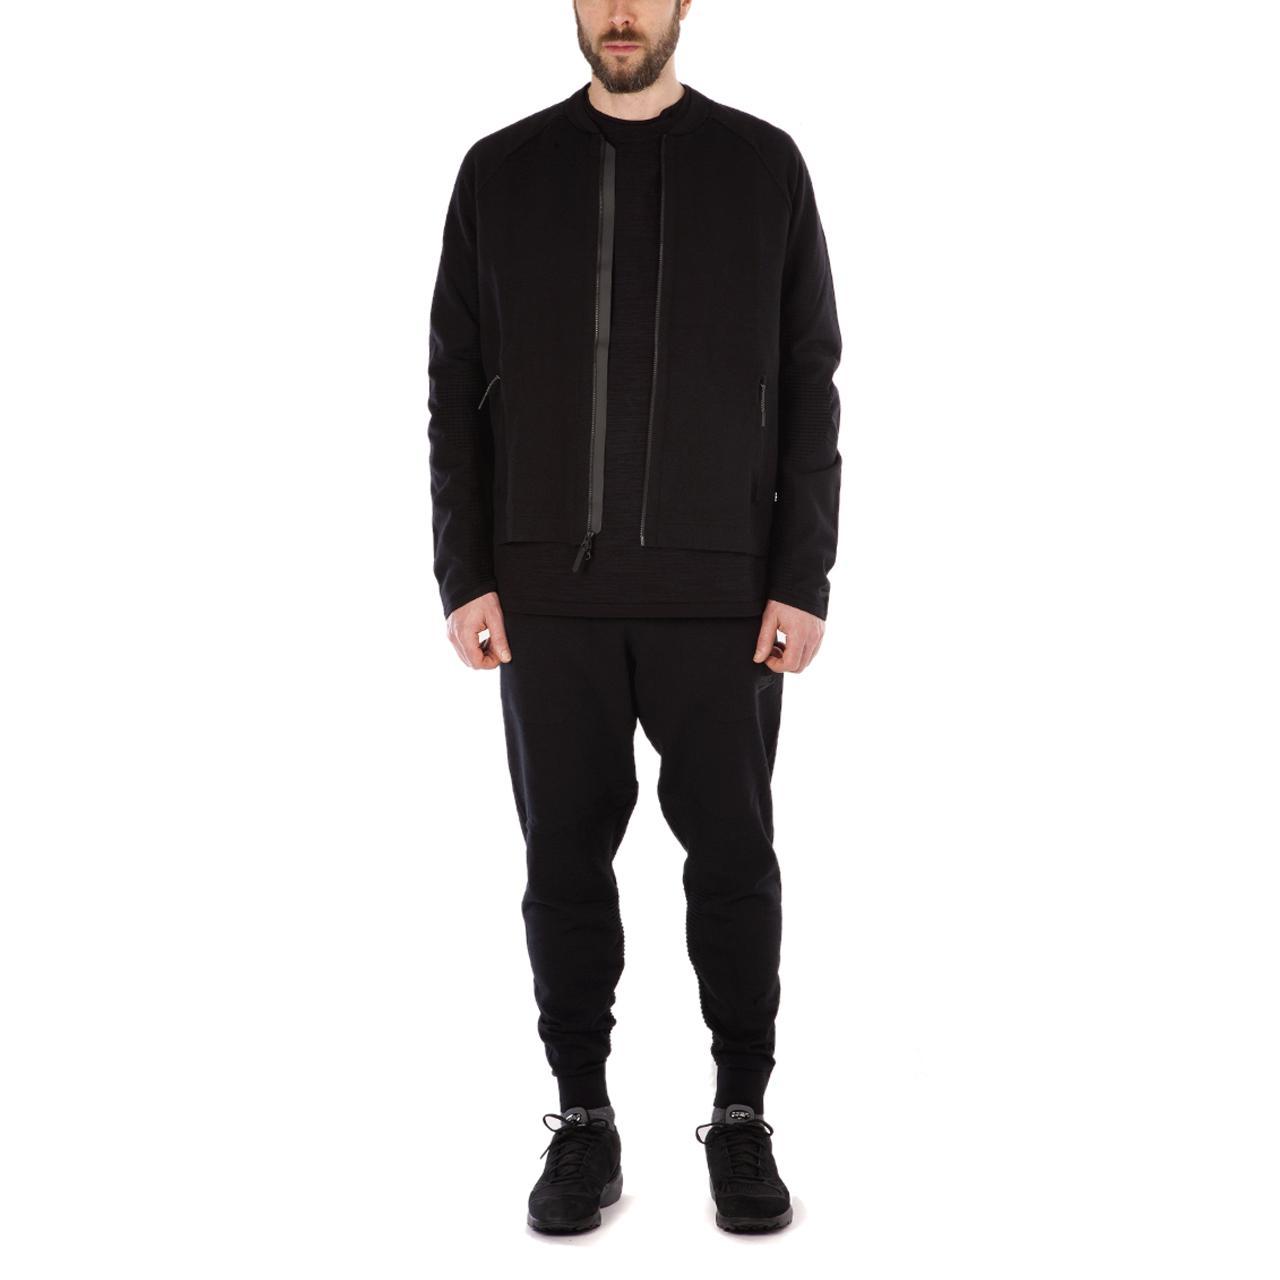 Nike Cotton Tech Knit Jacket in Black for Men